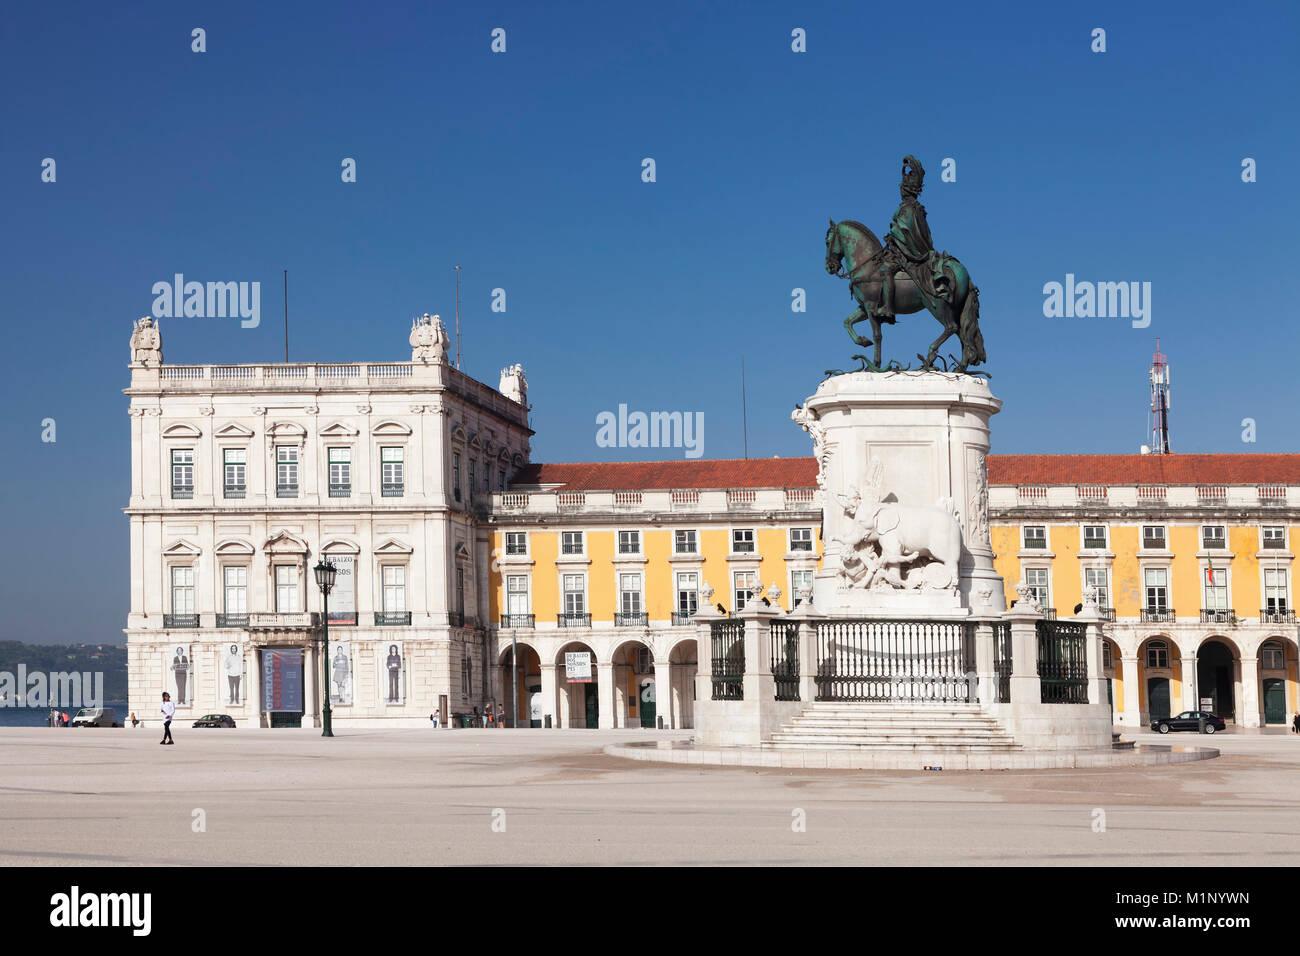 Praca do Comercio, Denkmal von König Jose ICH, Baixa, Lissabon, Portugal, Europa Stockbild